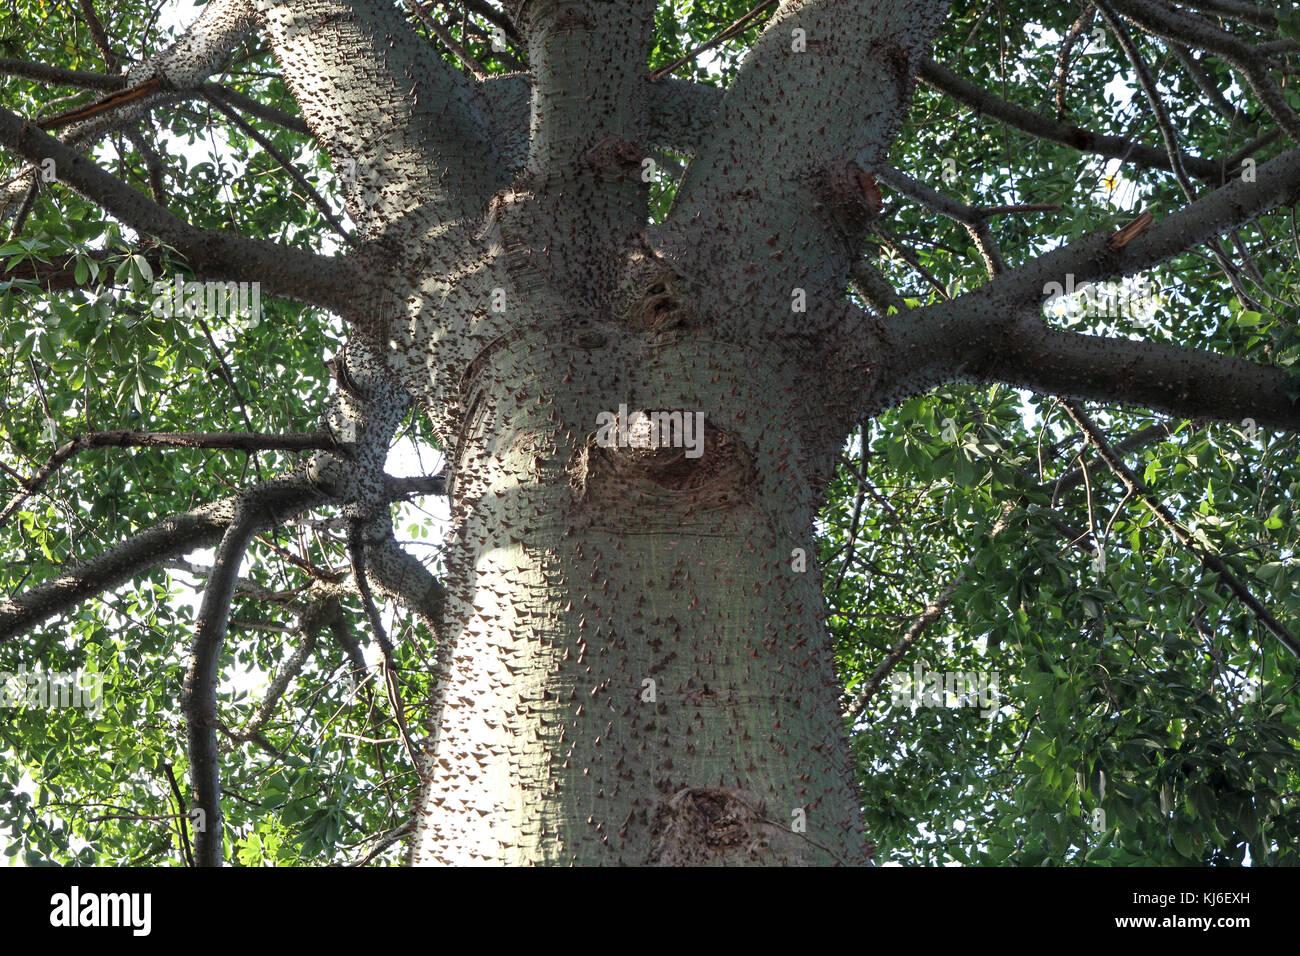 Silk Floss tree or Kapok tree, Pretoria, Gauteng, South Africa. Stock Photo